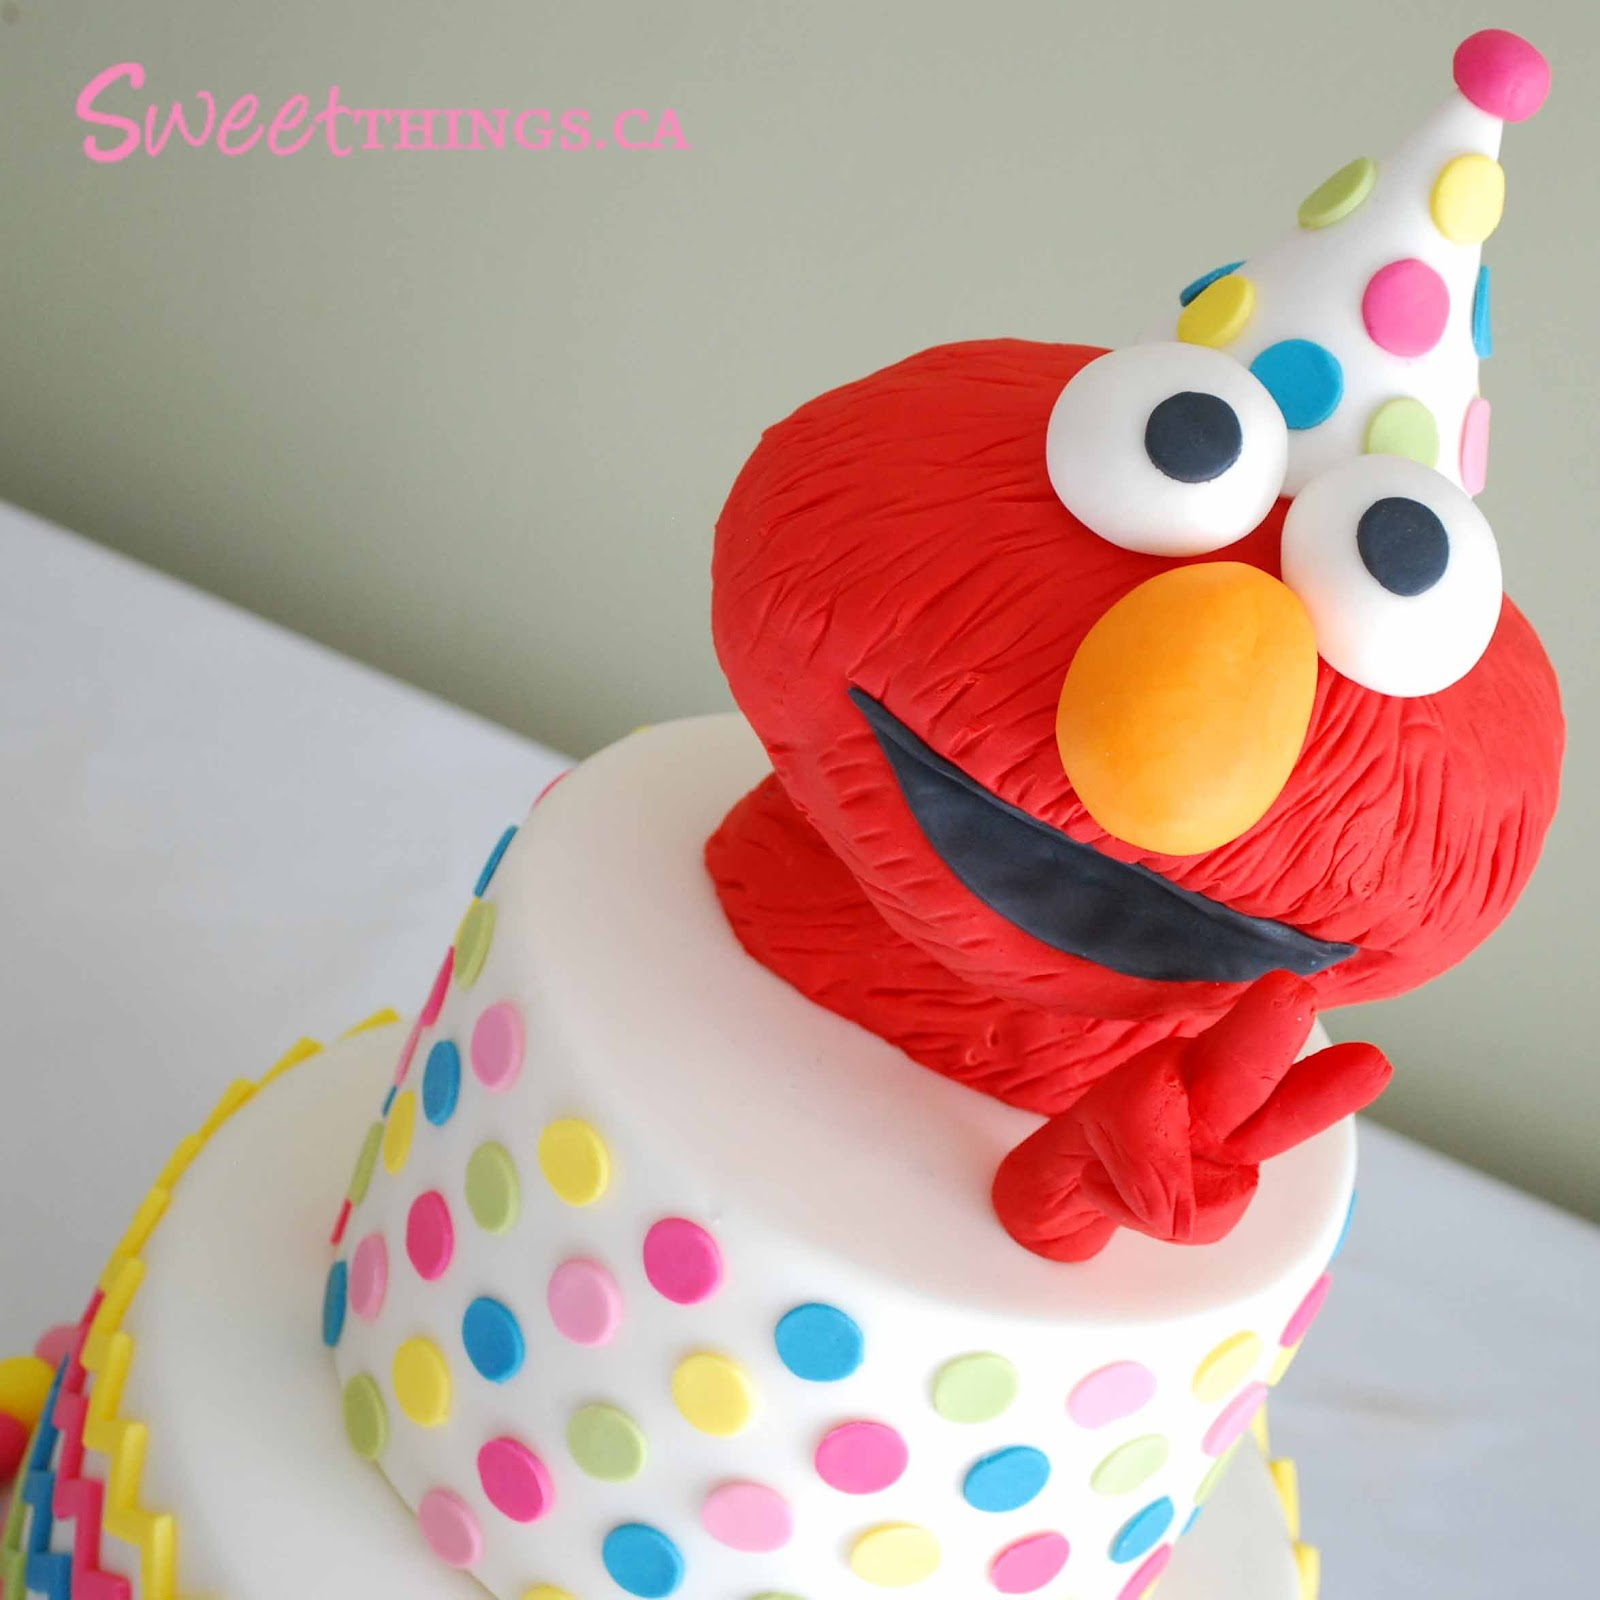 Sweetthings 2nd Birthday Cake Elmo Cake